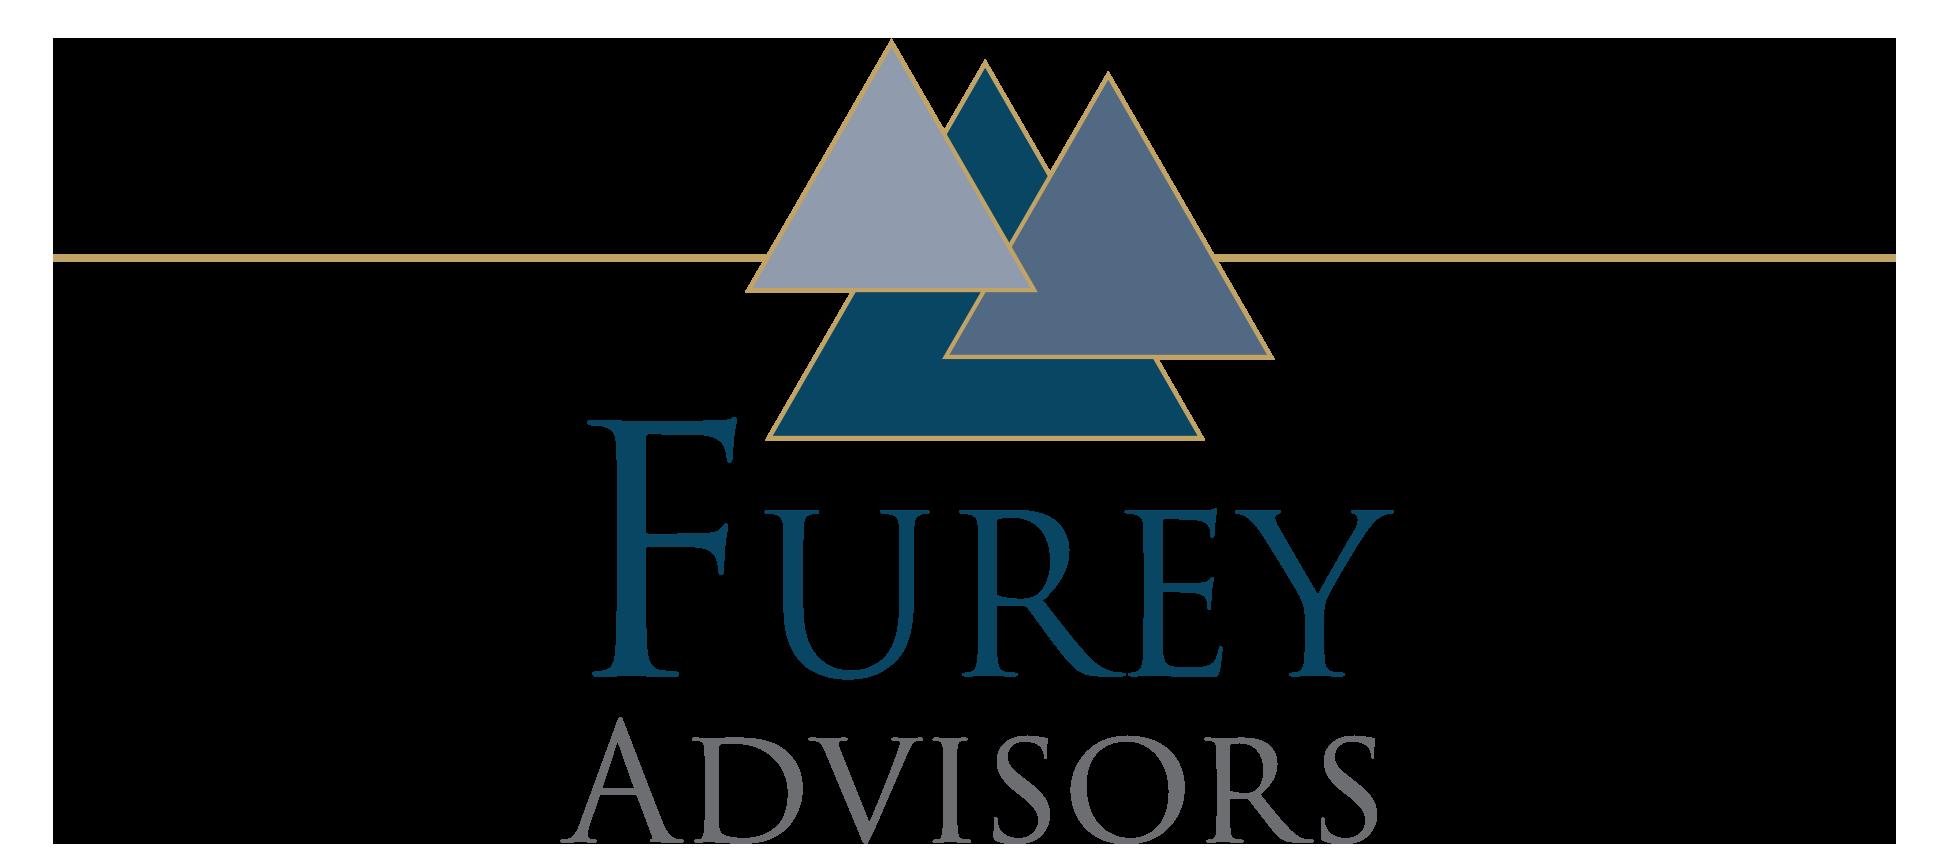 Furey Advisors Logo